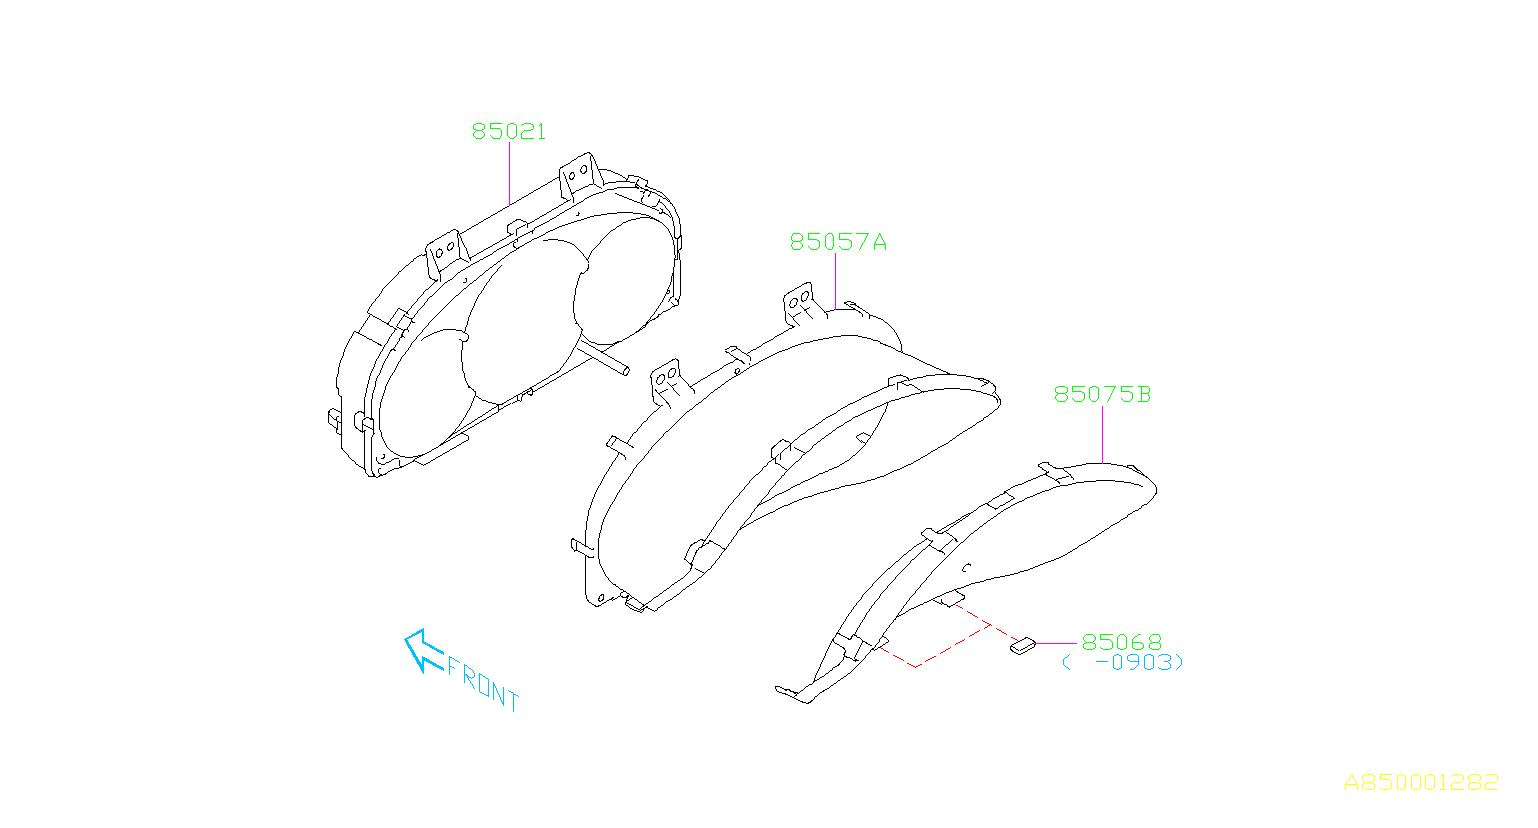 Subaru Forester Instrument Cluster. Meter Main